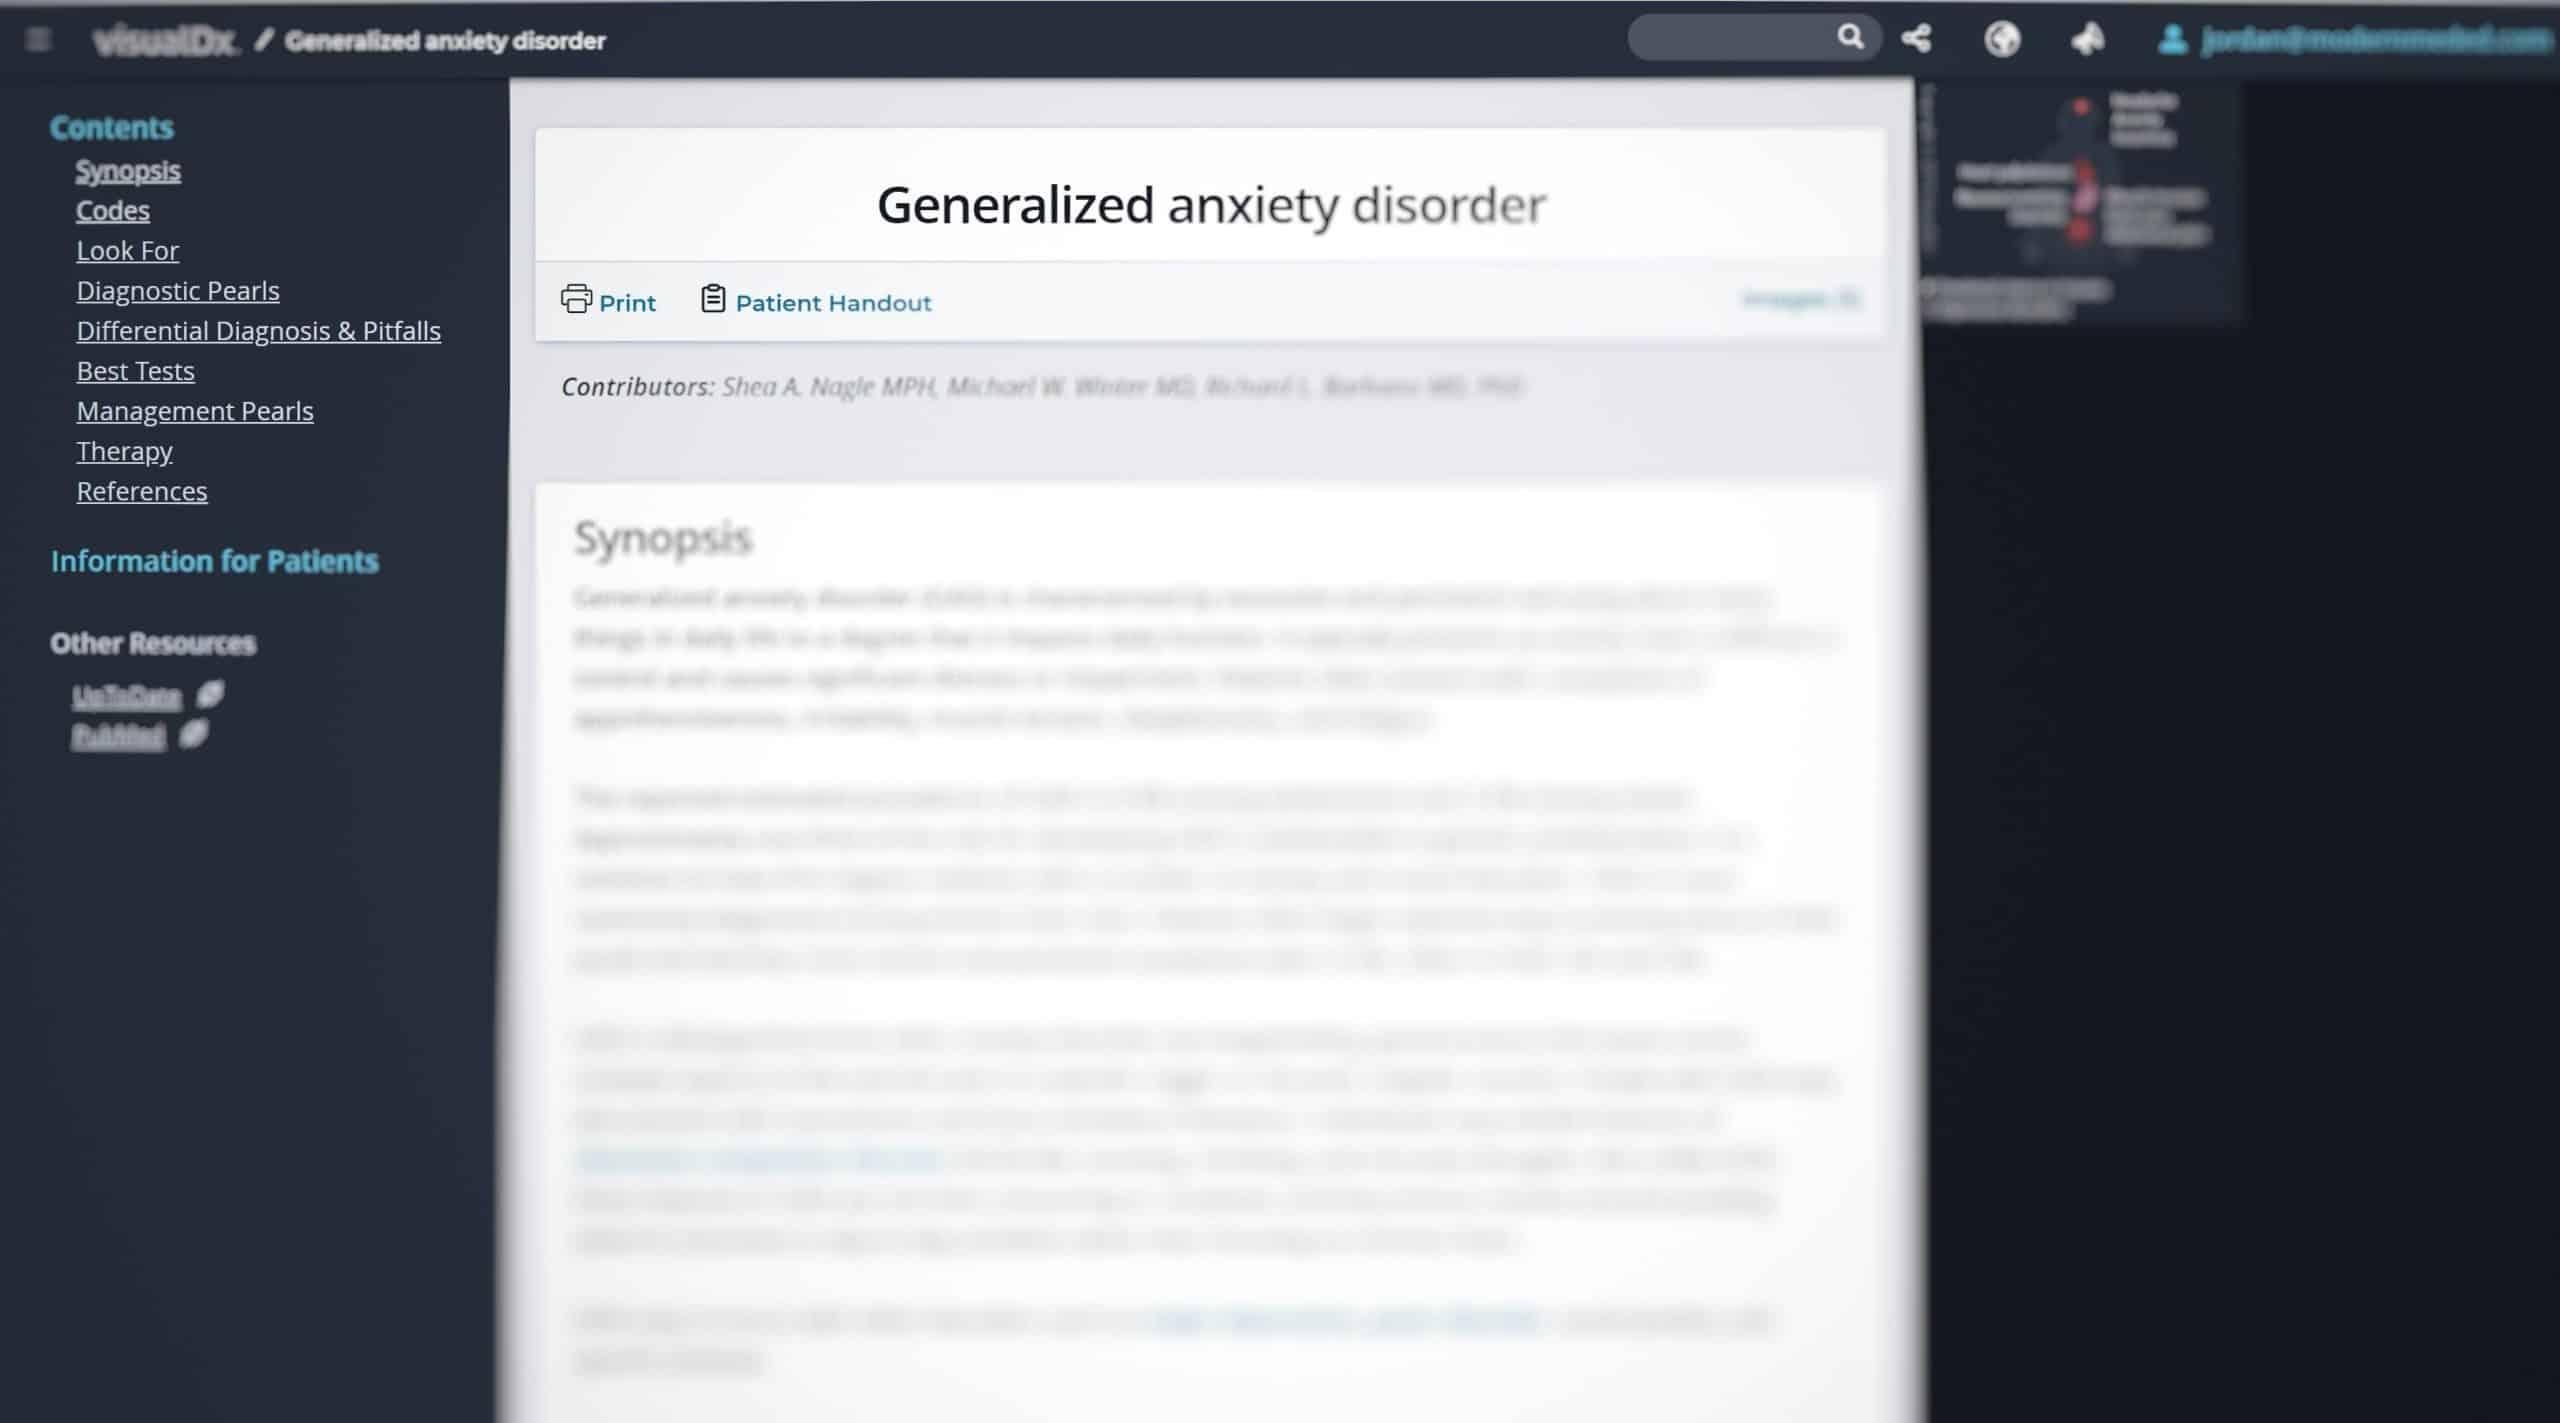 VisualDx GAD synopsis